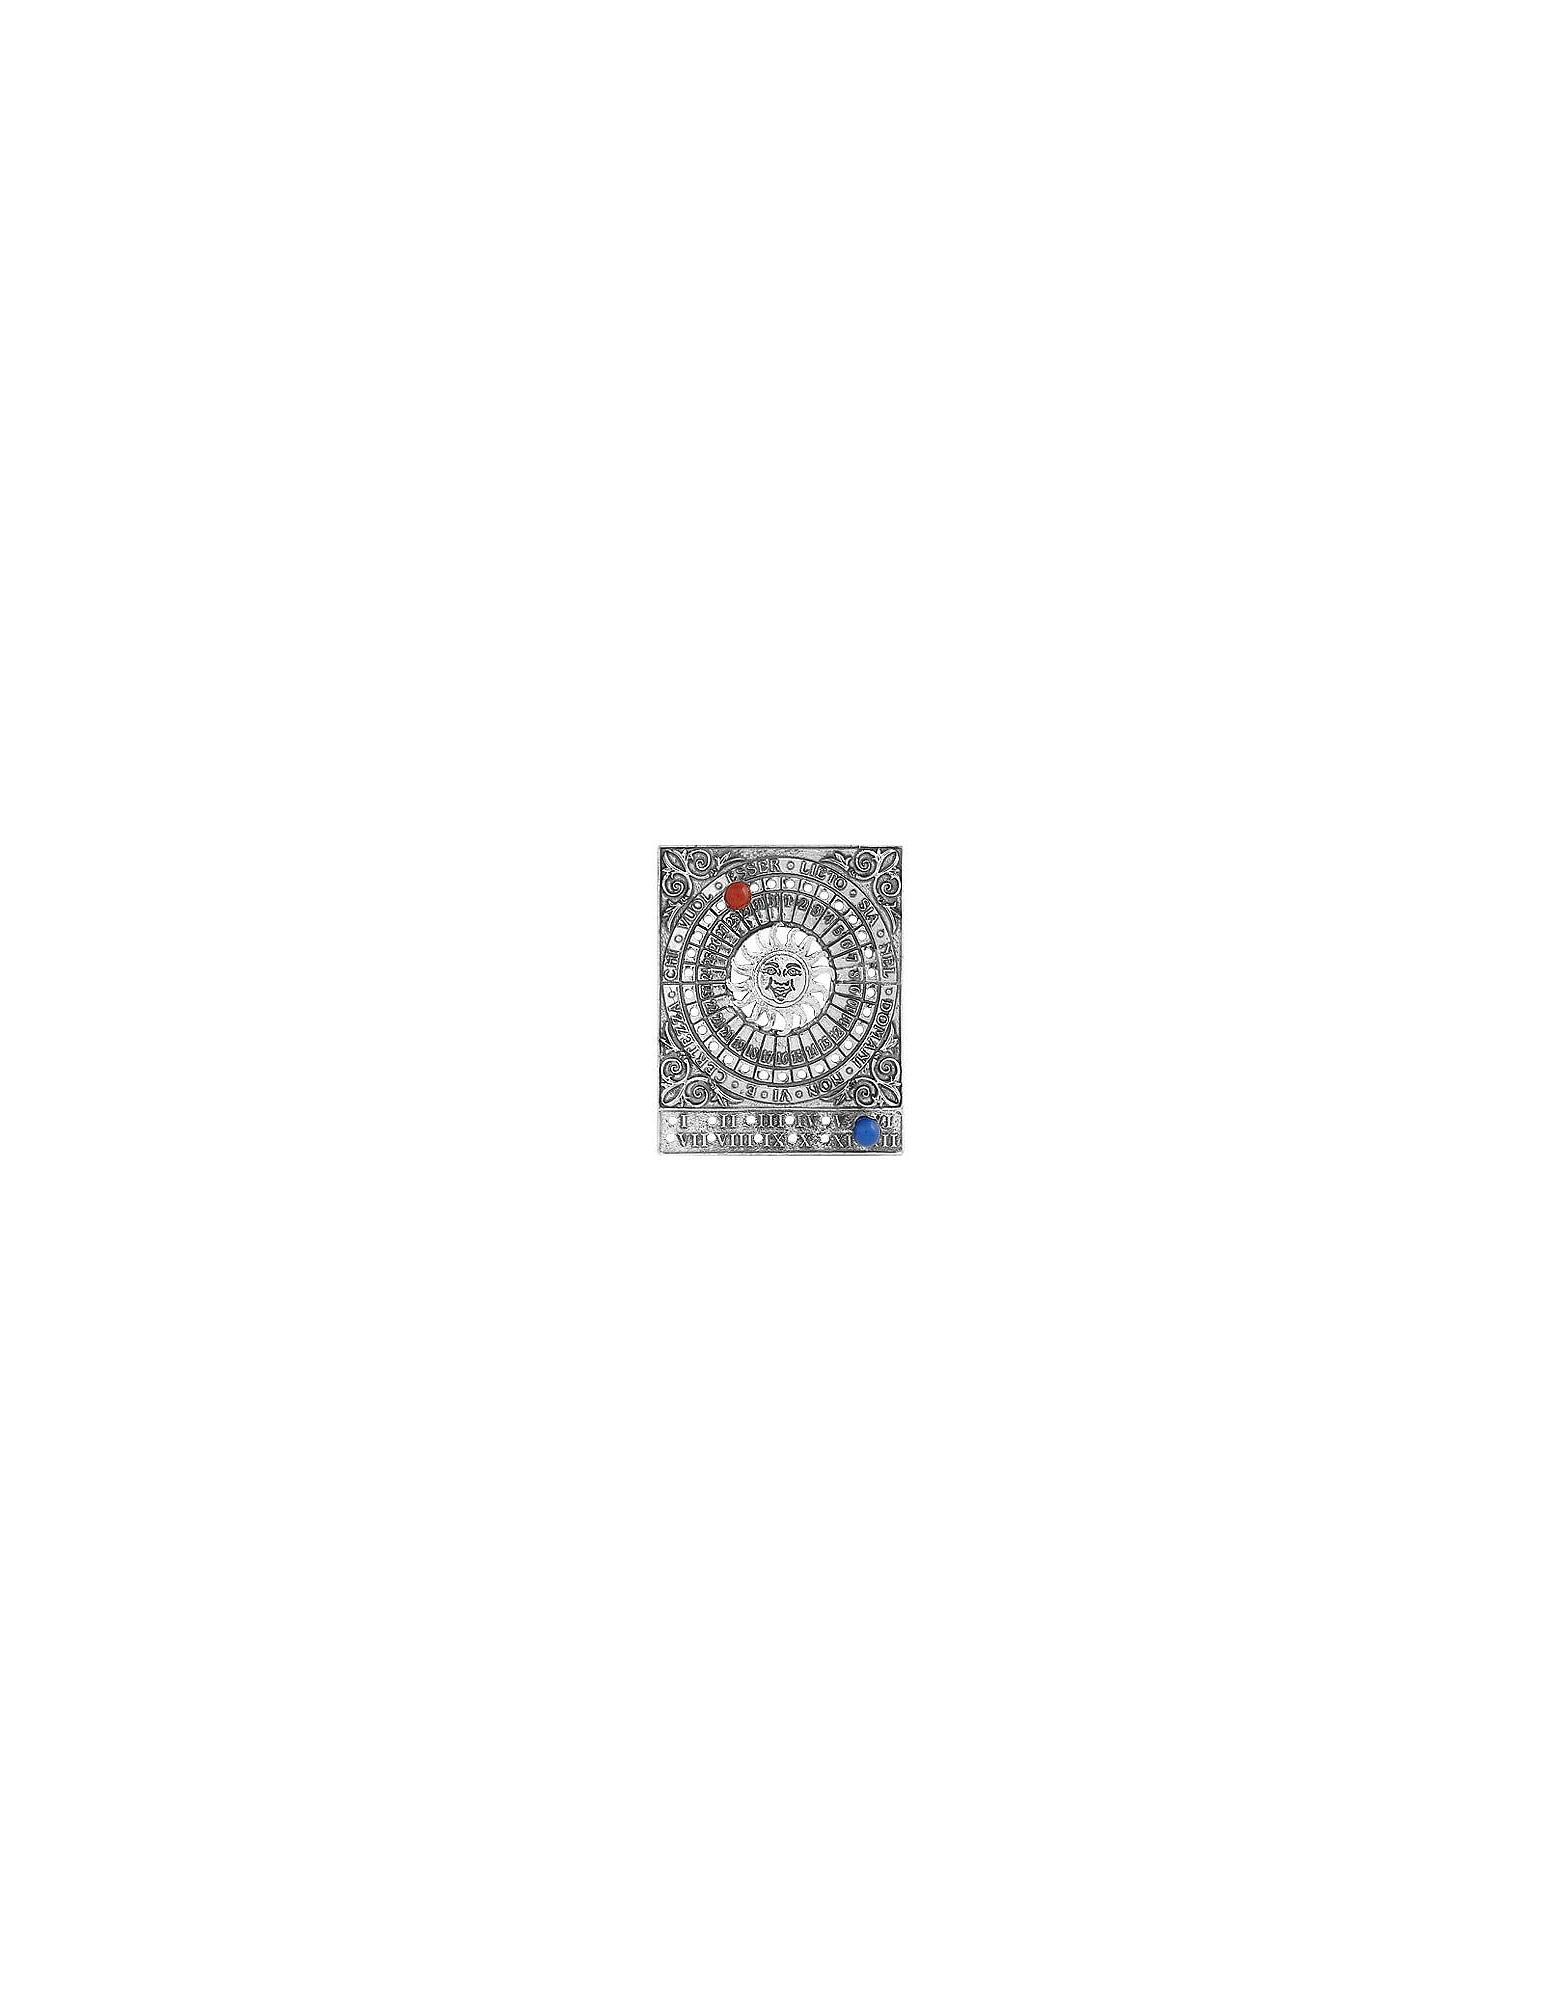 Torrini Silver Giftware, Lorenzo's Sterling Silver Perpetual Calendar